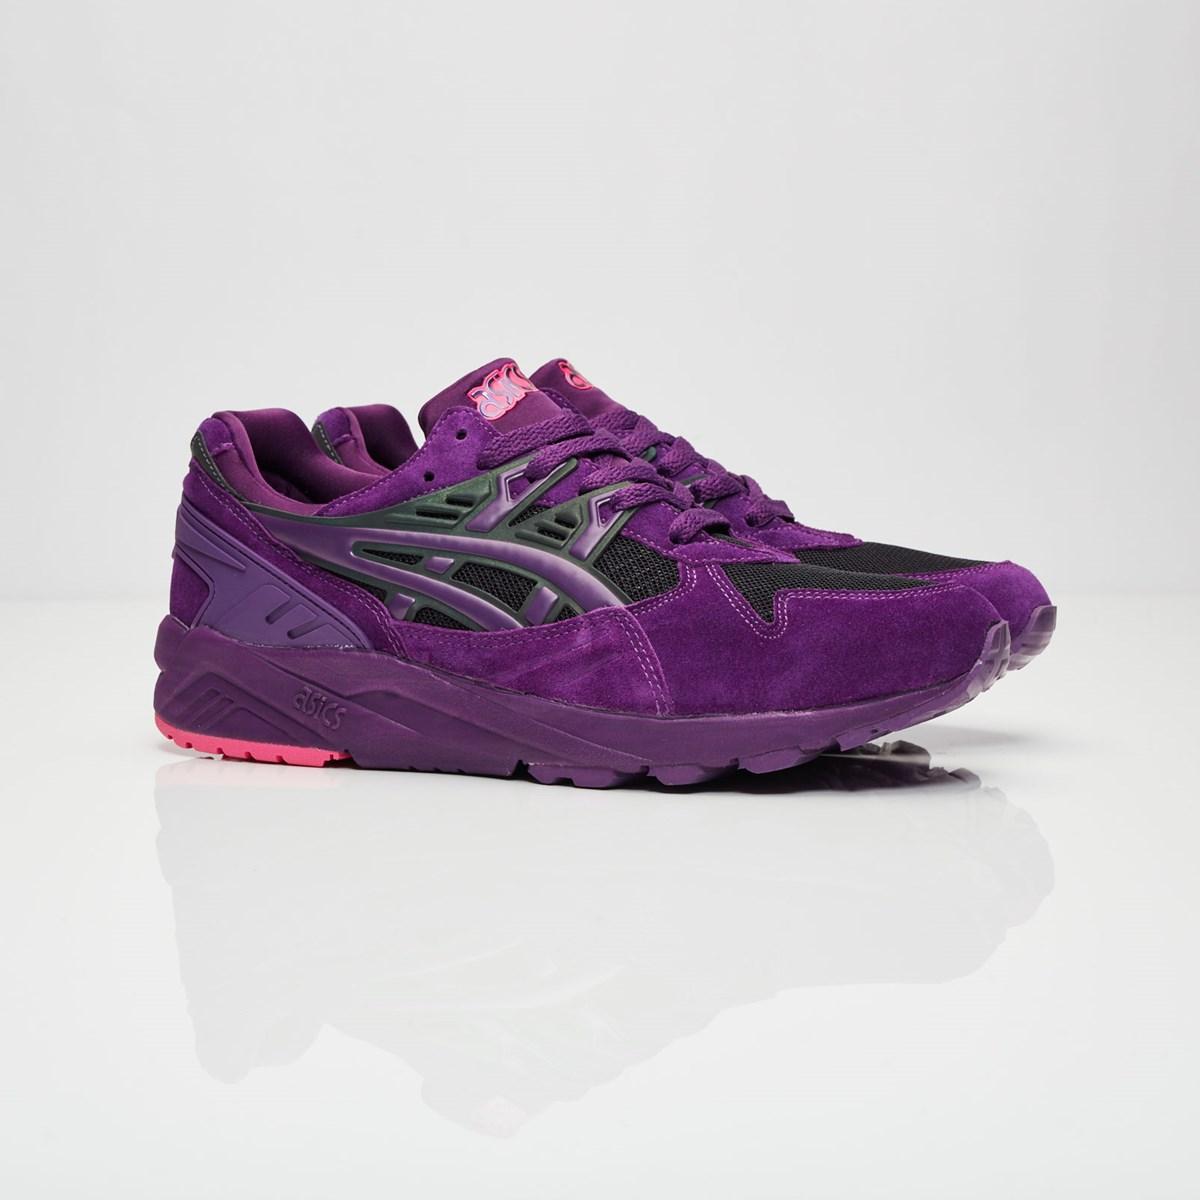 best service 3b0e8 92a56 asics tiger gel kayano trainer str h6m3n 3320 sneakers   streetwear på  nätet sen 1.